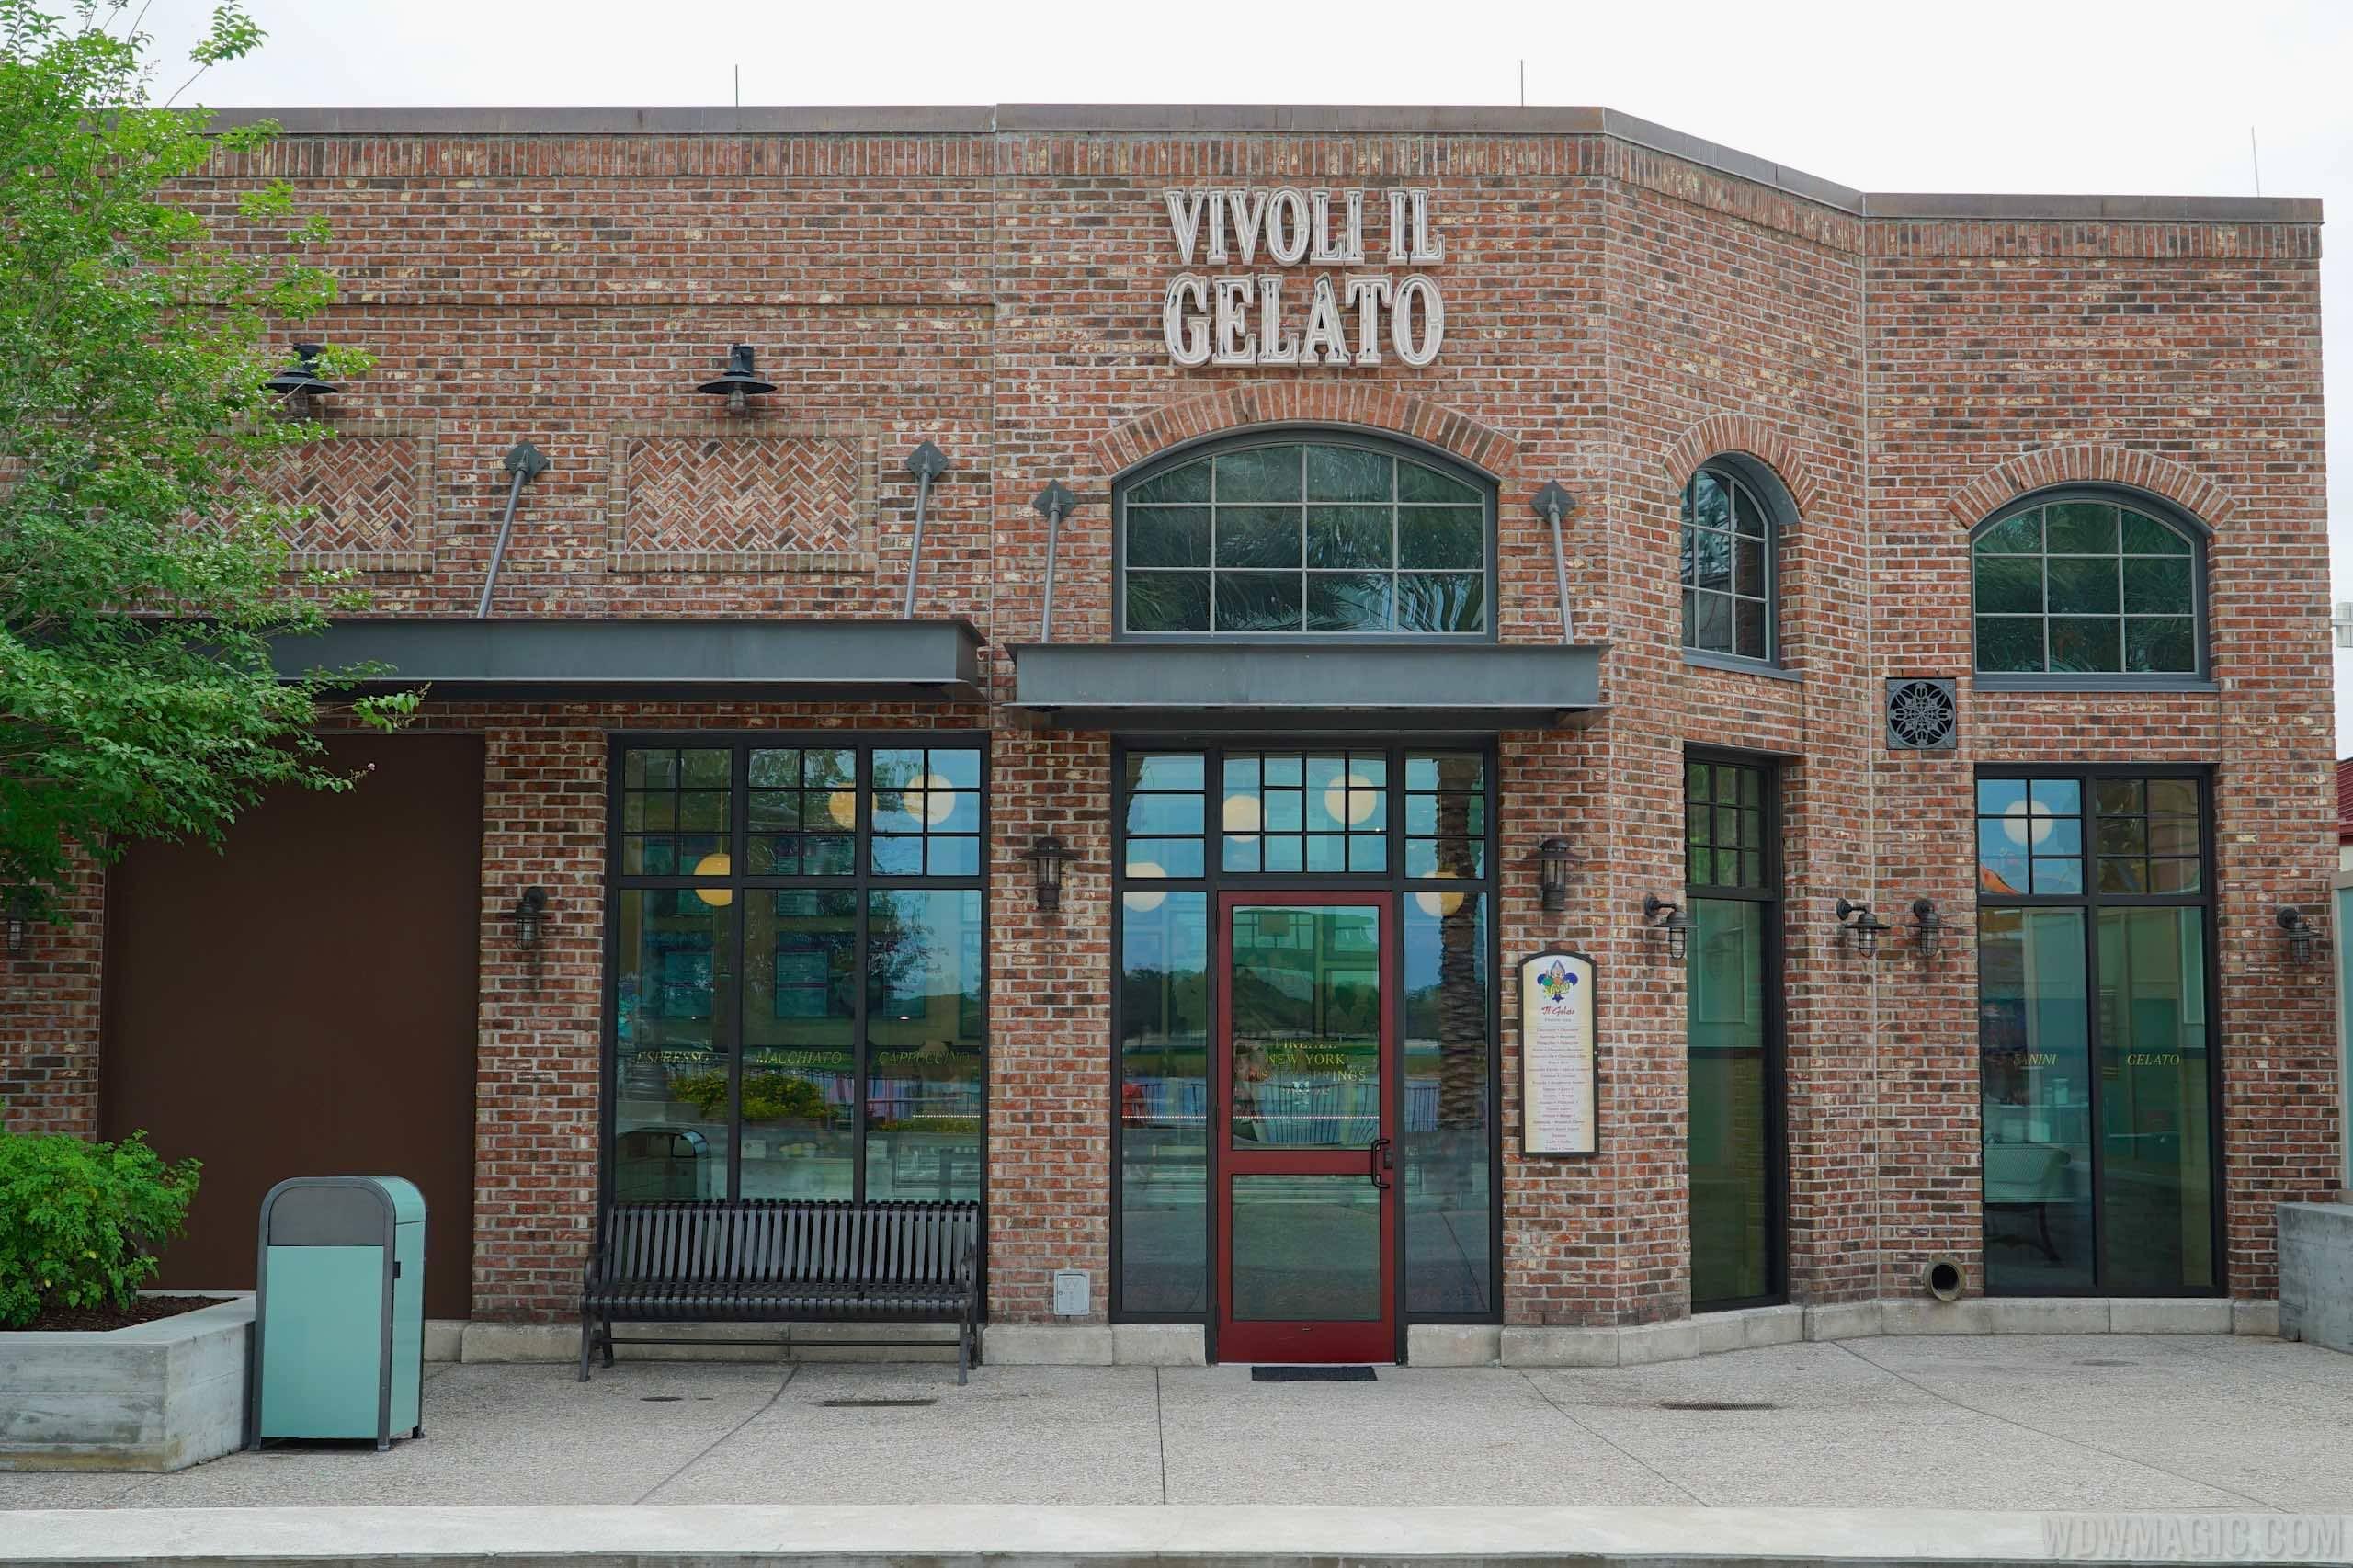 Vivoli Gelateria interior and food